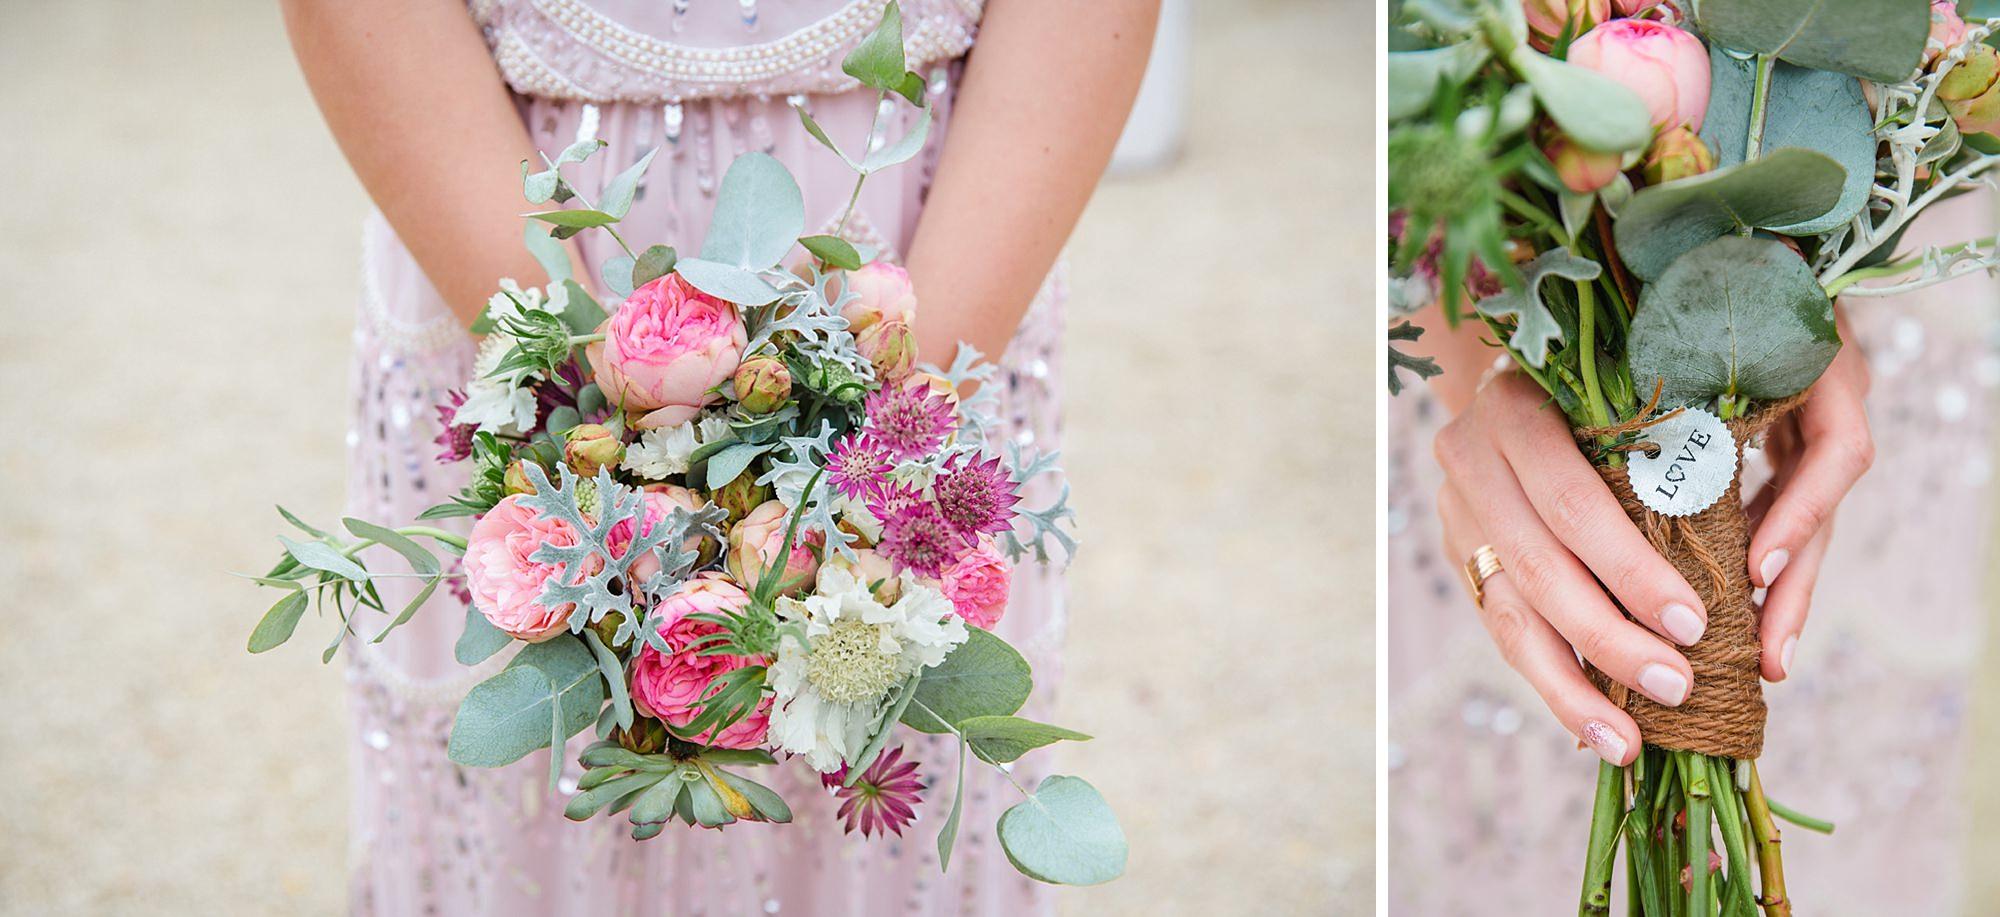 outdoor humanist wedding photography bridesmaids bouquet